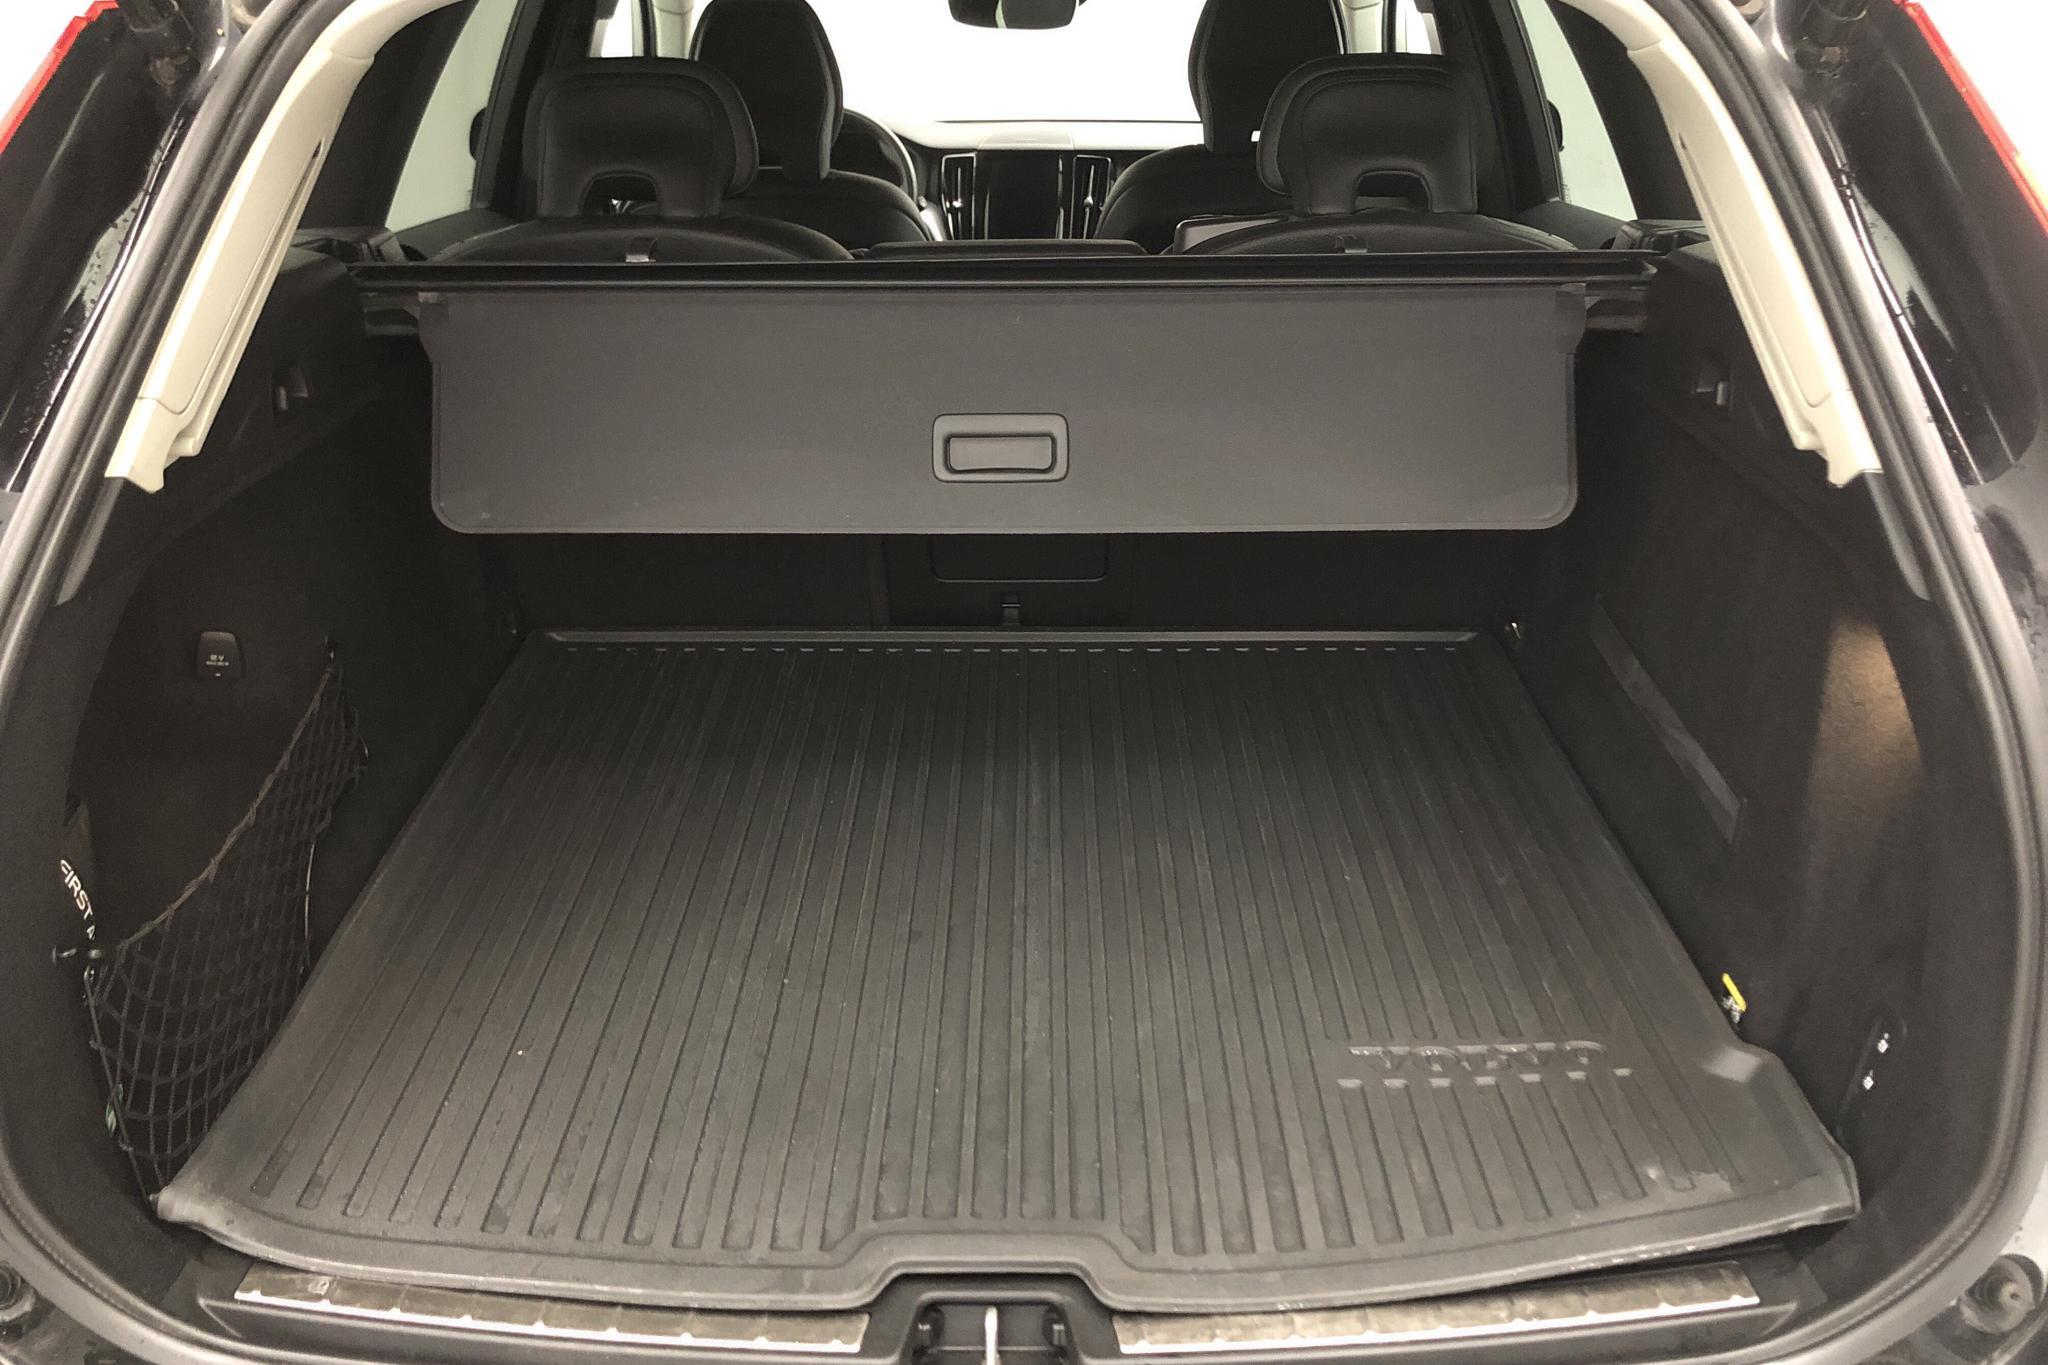 Volvo XC60 T5 AWD (250hk) - 62 600 km - Automatic - black - 2019